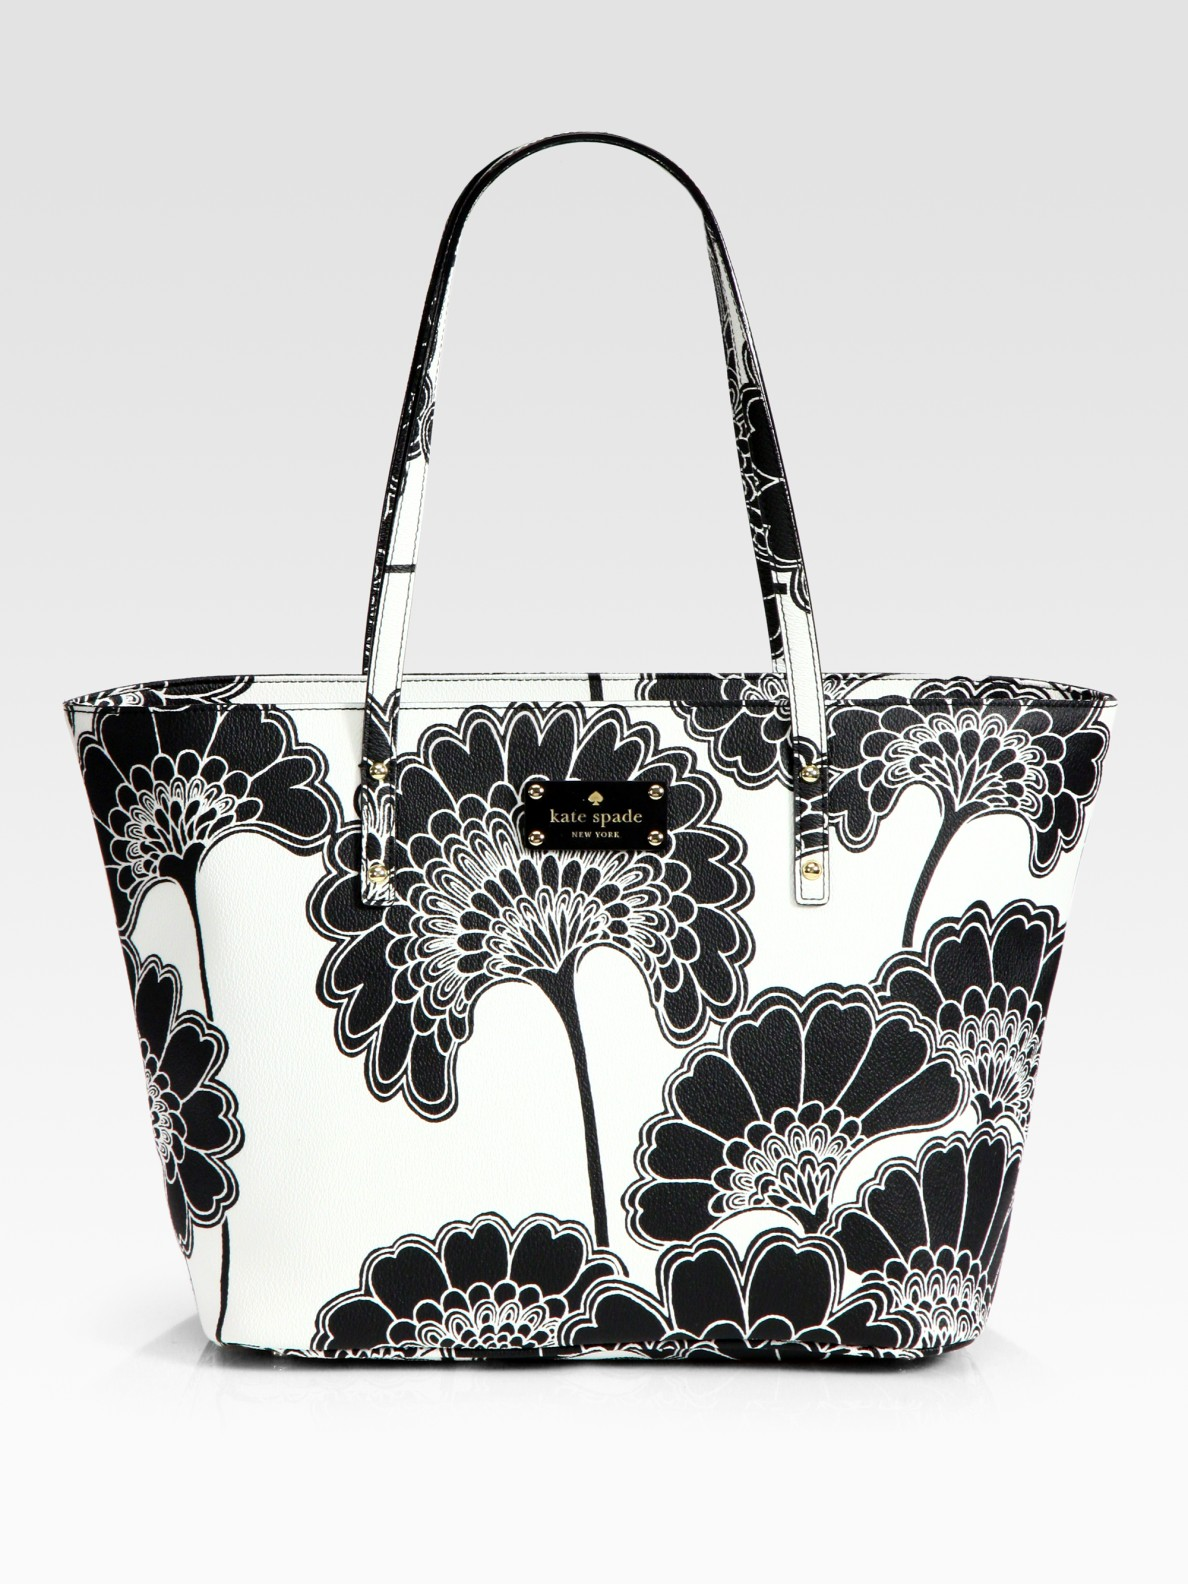 Lyst Kate Spade New York Harmony Floral Vinyl Tote Bag